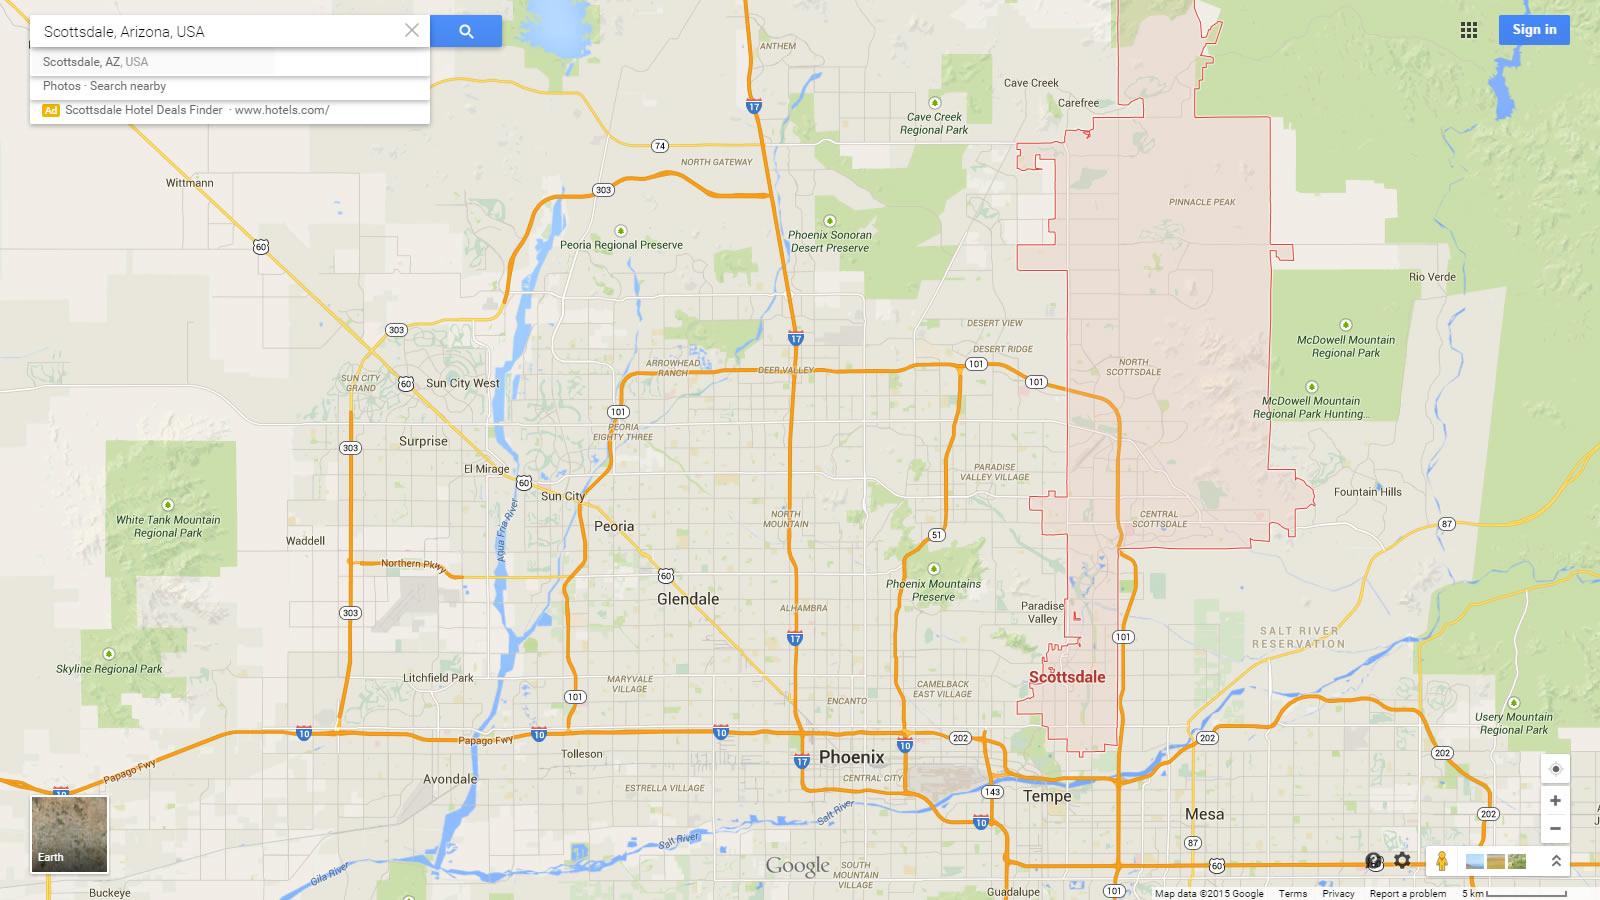 Map Of Arizona Scottsdale.Scottsdale Arizona Map